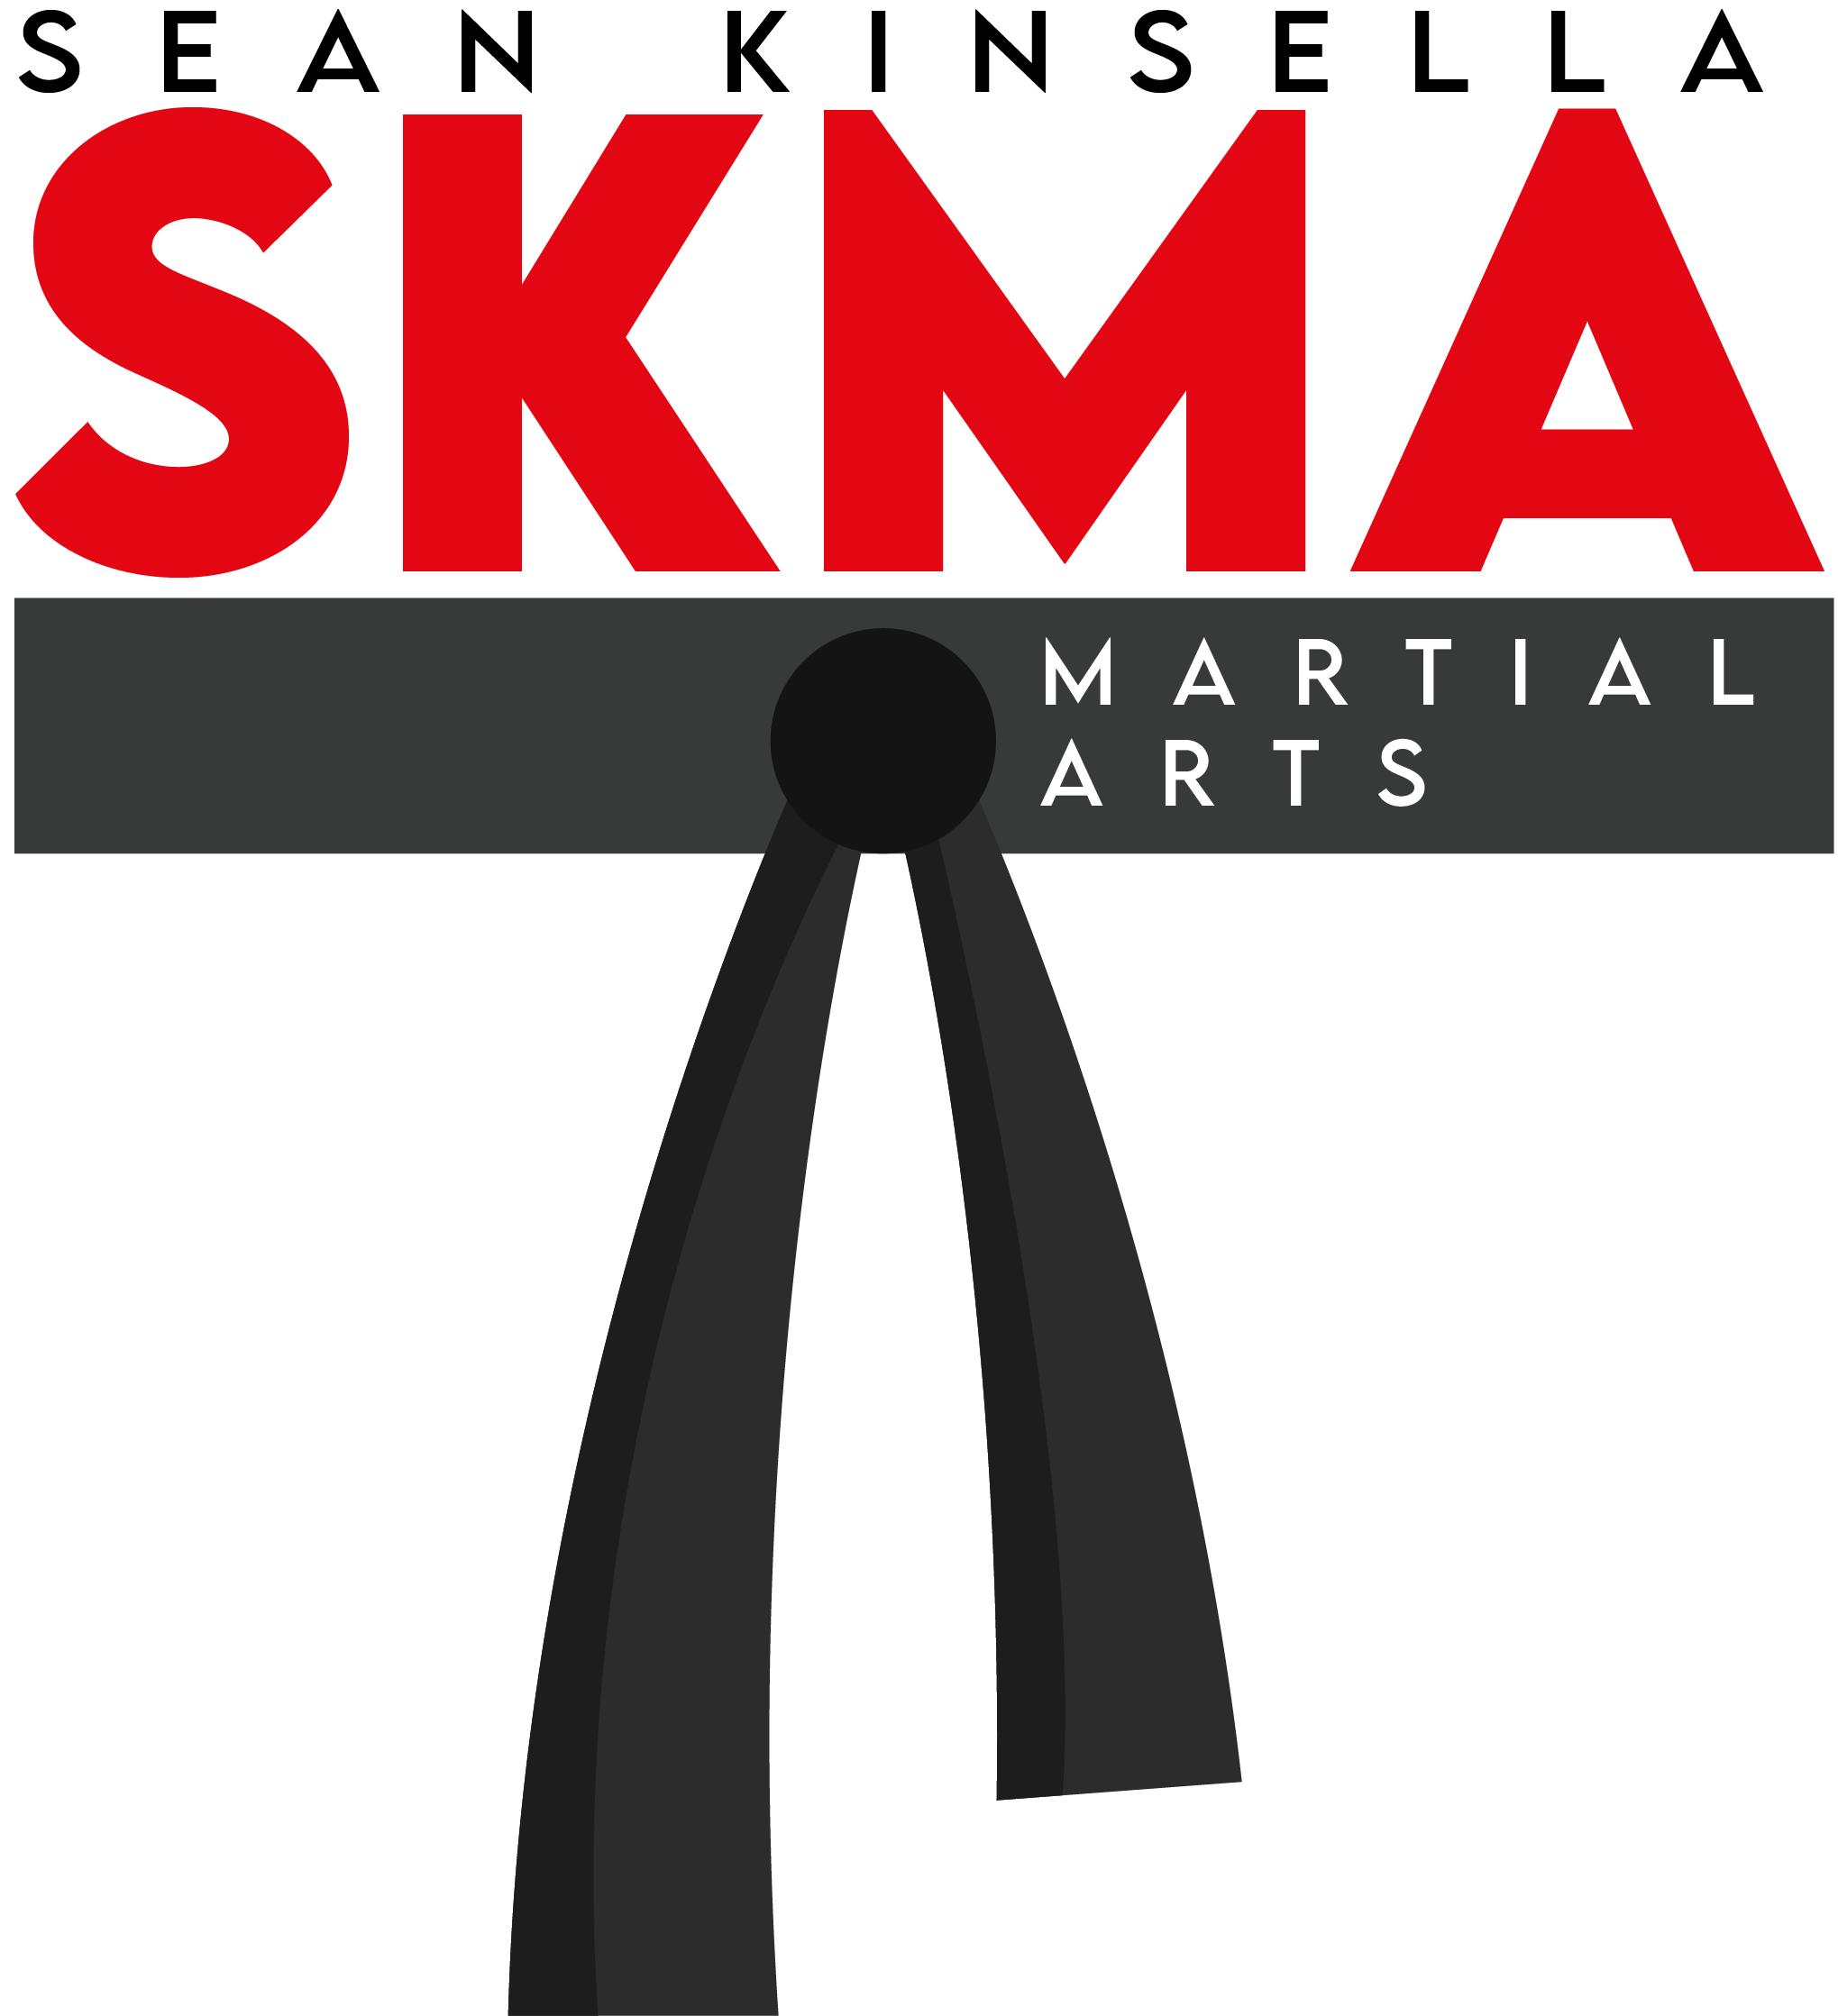 Sean Kinsella Martial Arts - Martial Arts Classes in Eastbourne